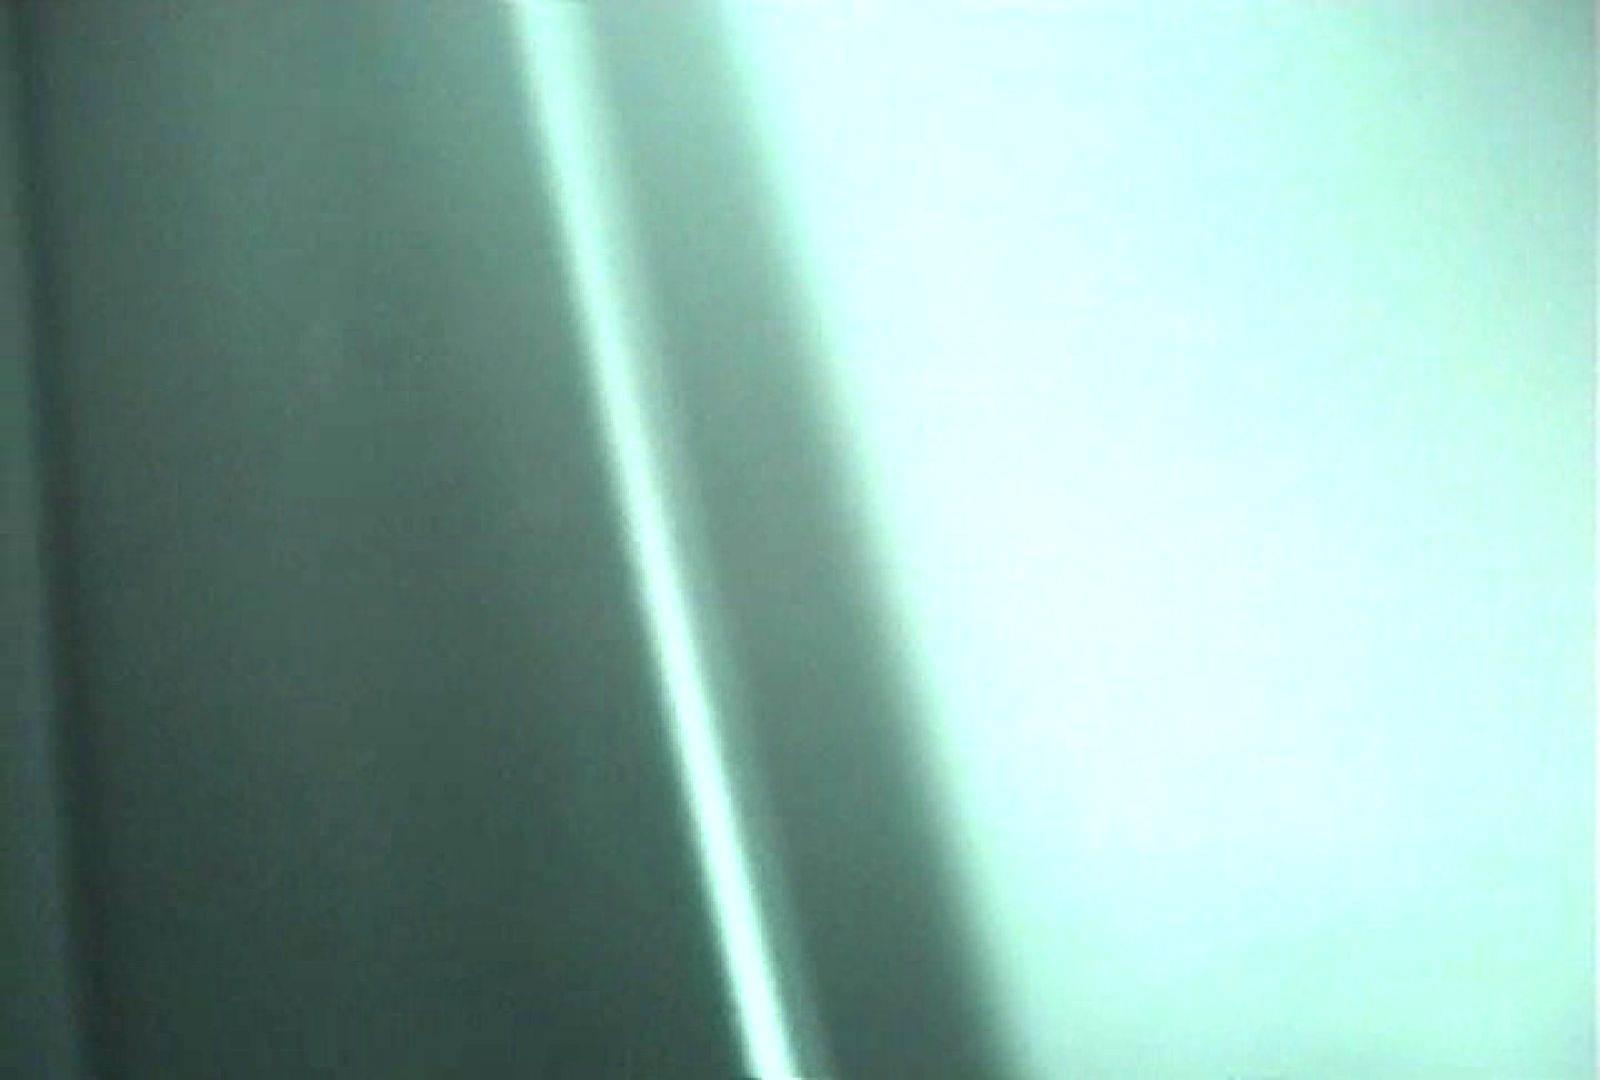 充血監督の深夜の運動会Vol.47 OLヌード天国 SEX無修正画像 70PIX 53